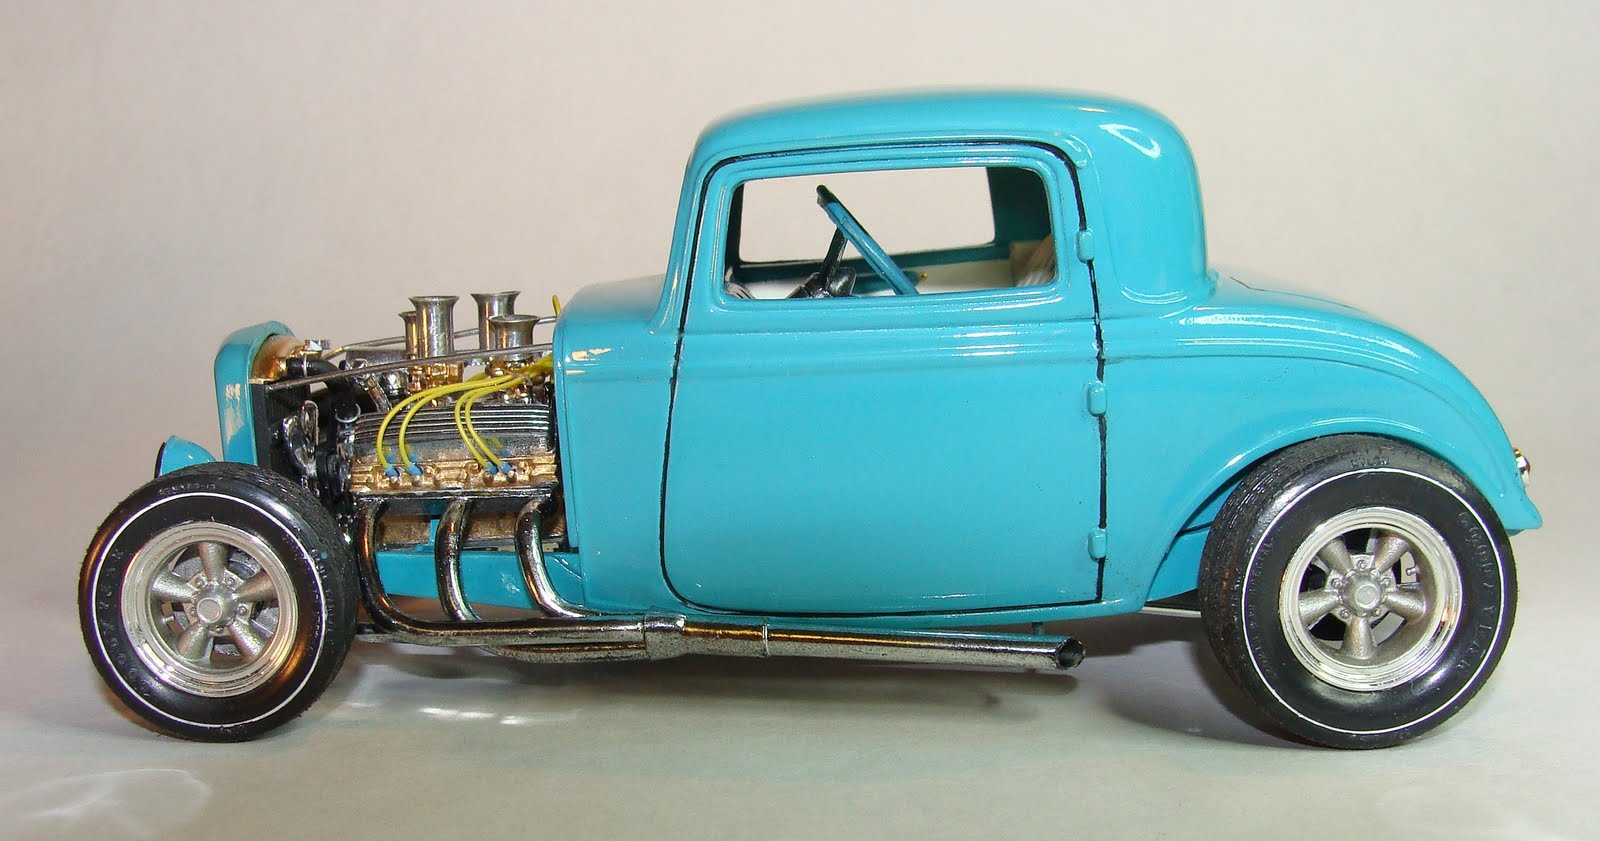 Lowboycoupr on Model Car 1932 Ford Rods